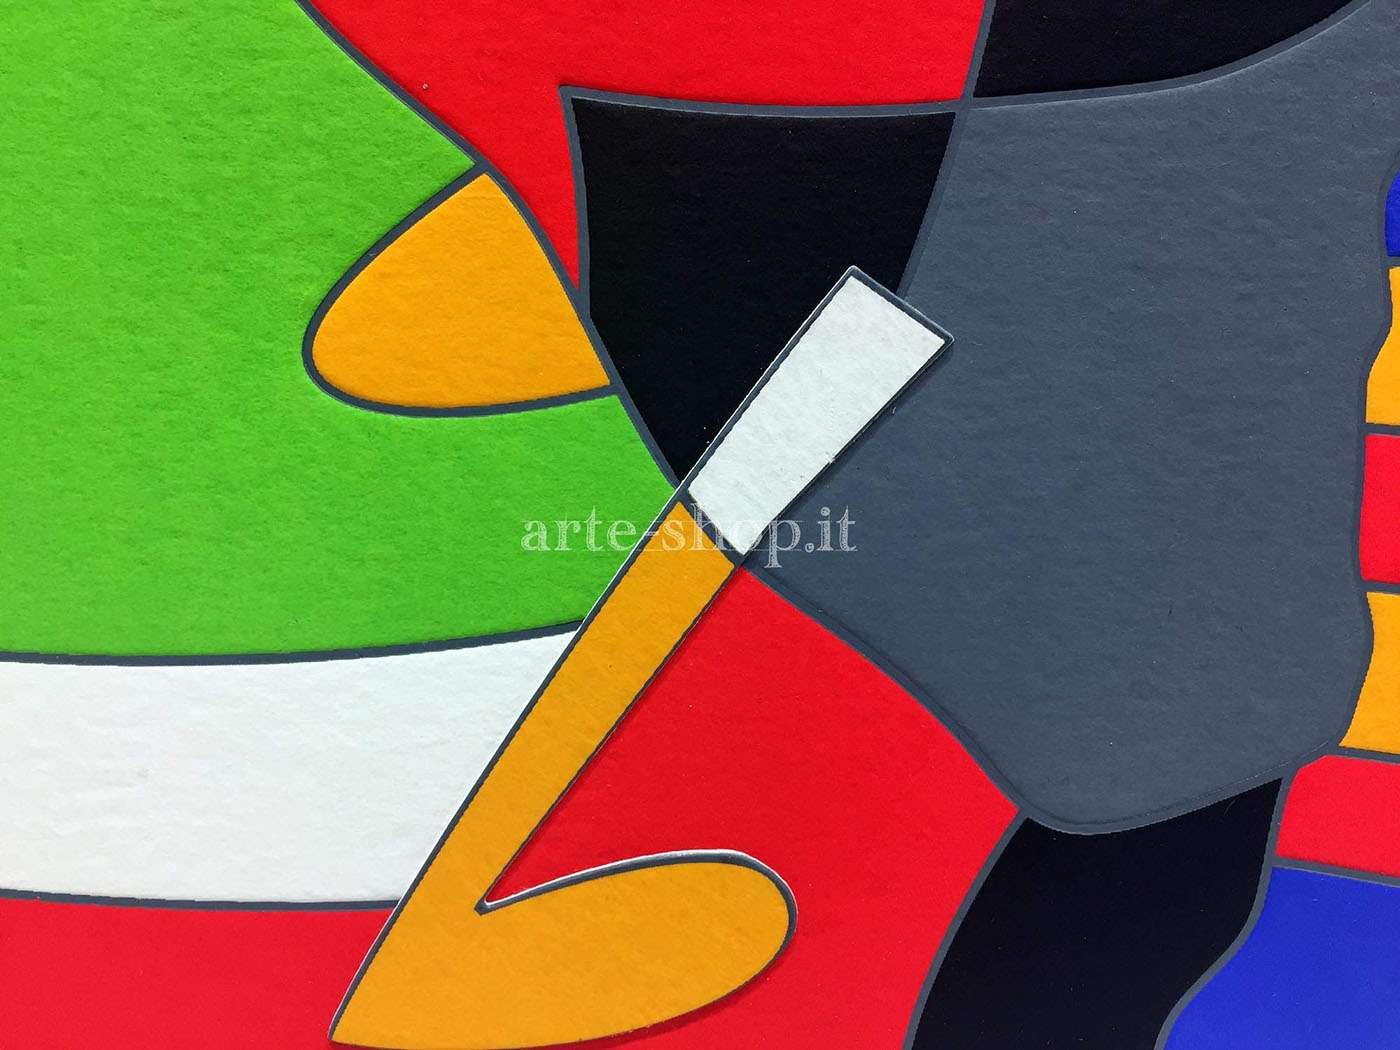 arte pentagono shop dettaglio numero 391